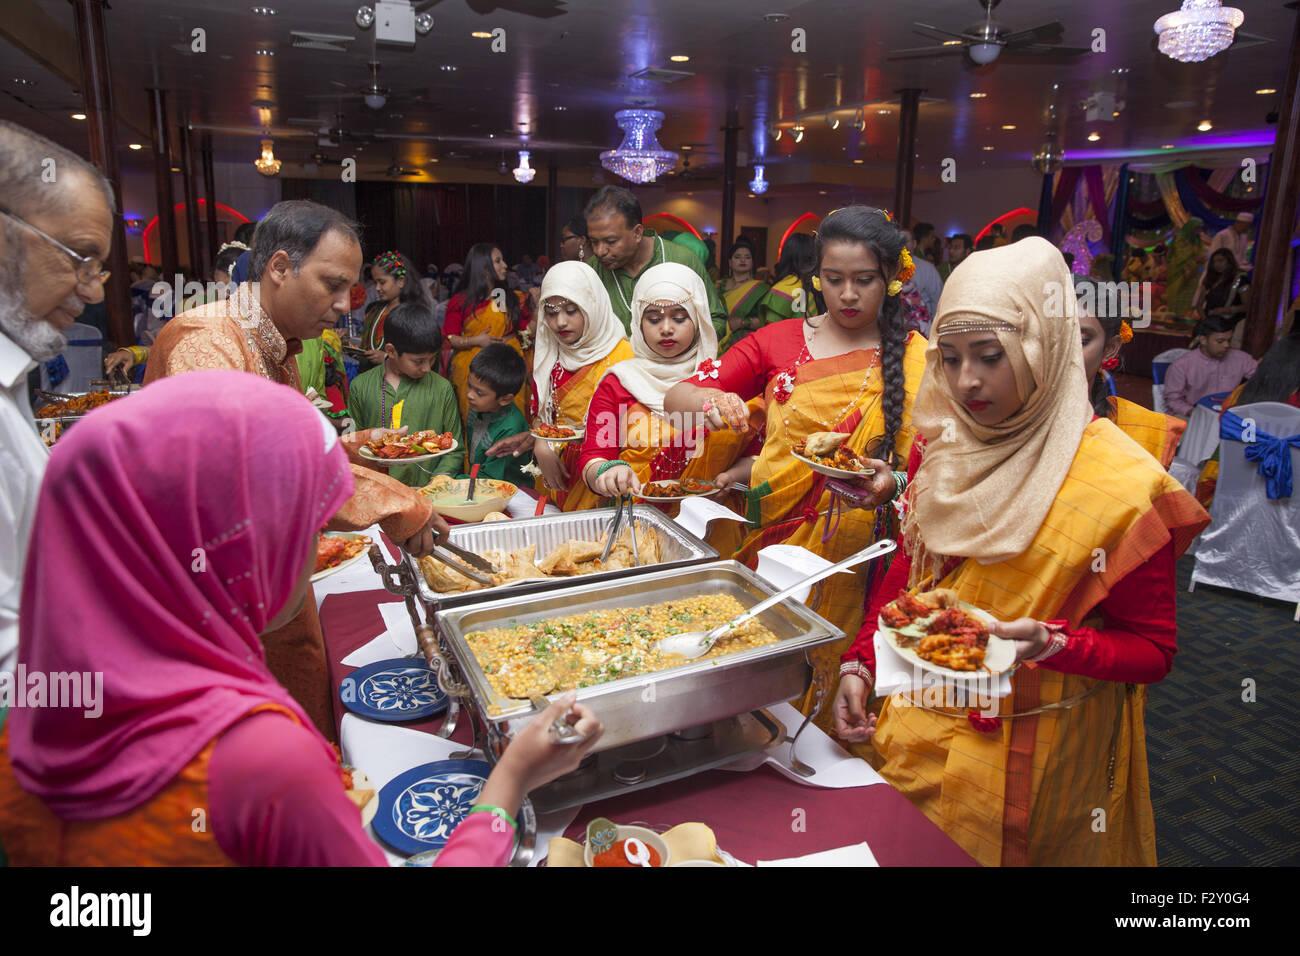 Time For Some Eats At A Bangladeshi Muslim Wedding